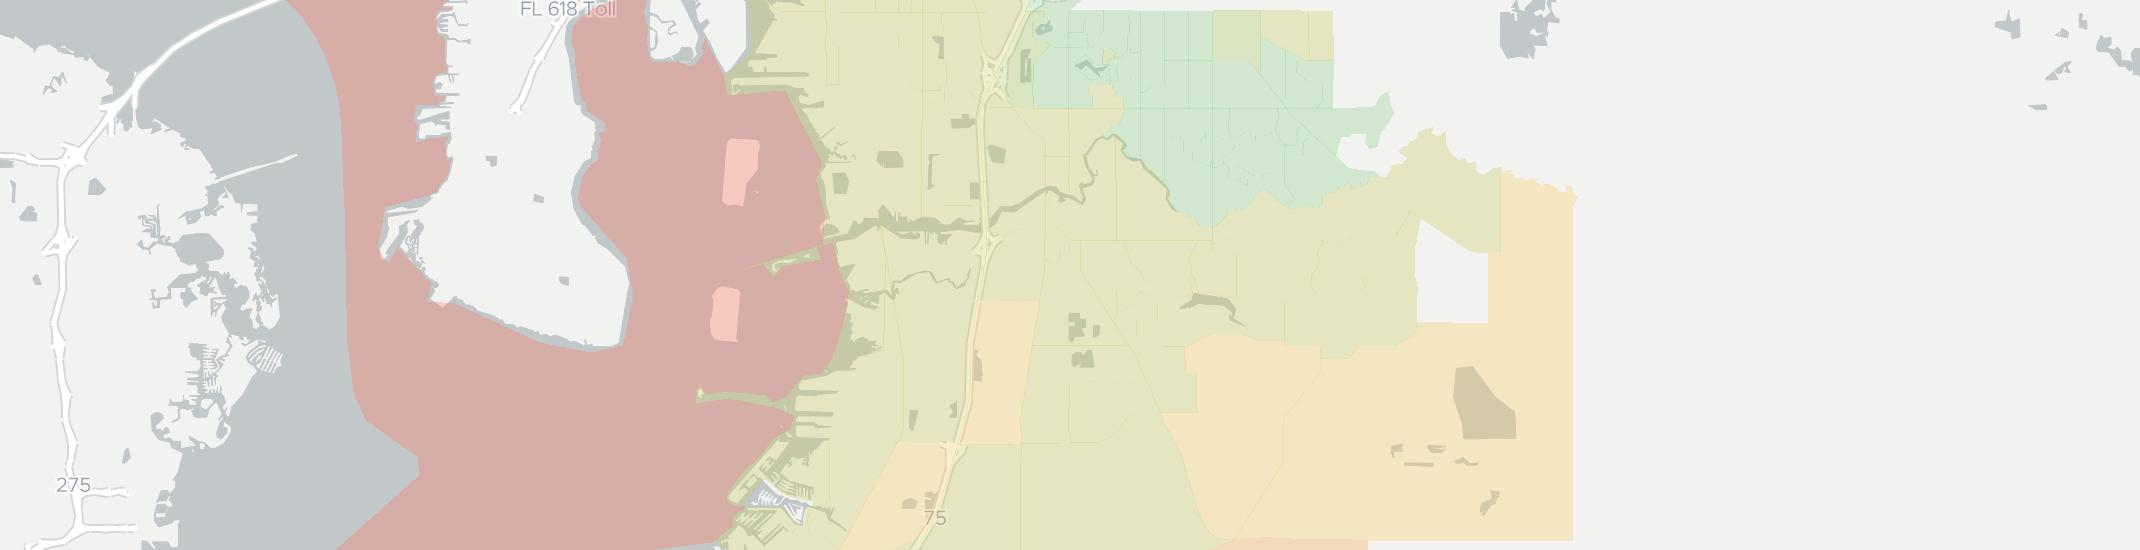 Riverview Florida Map.Riverview Fl Has 17 Internet Service Providers Broadbandnow Com